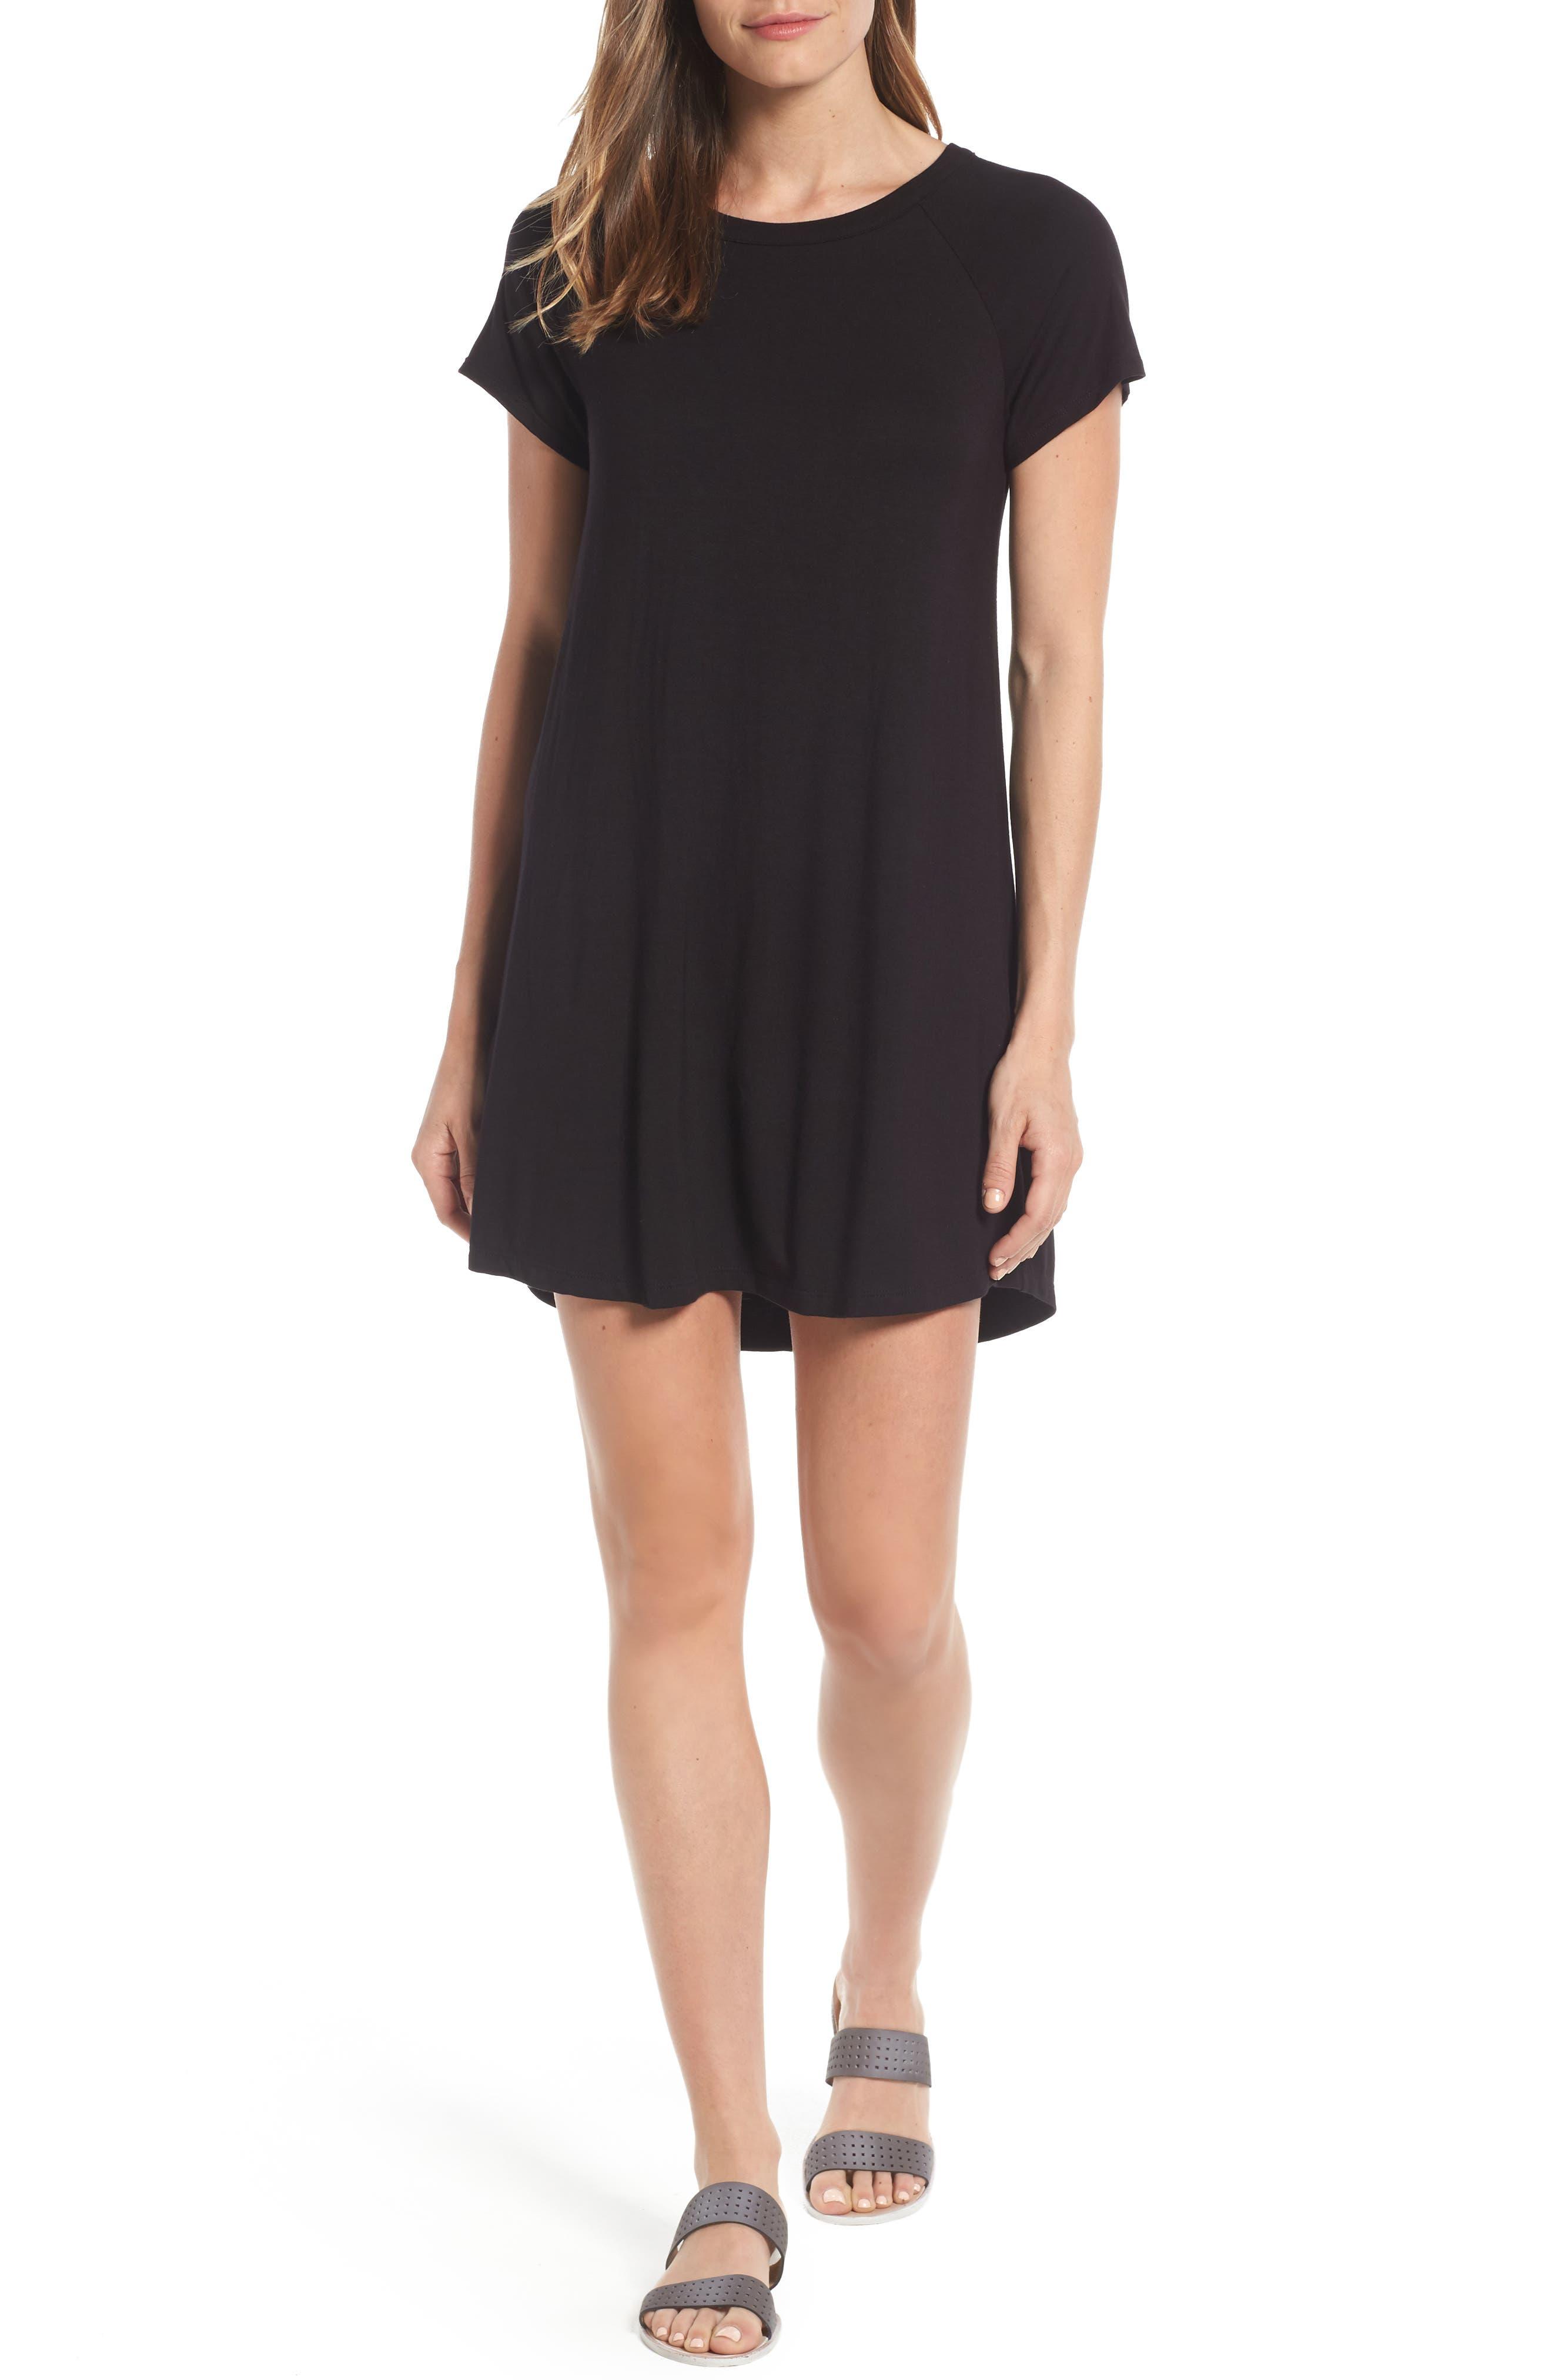 Alternate Image 1 Selected - Bobeau Back Cutout Tunic Dress (Regular & Petite)